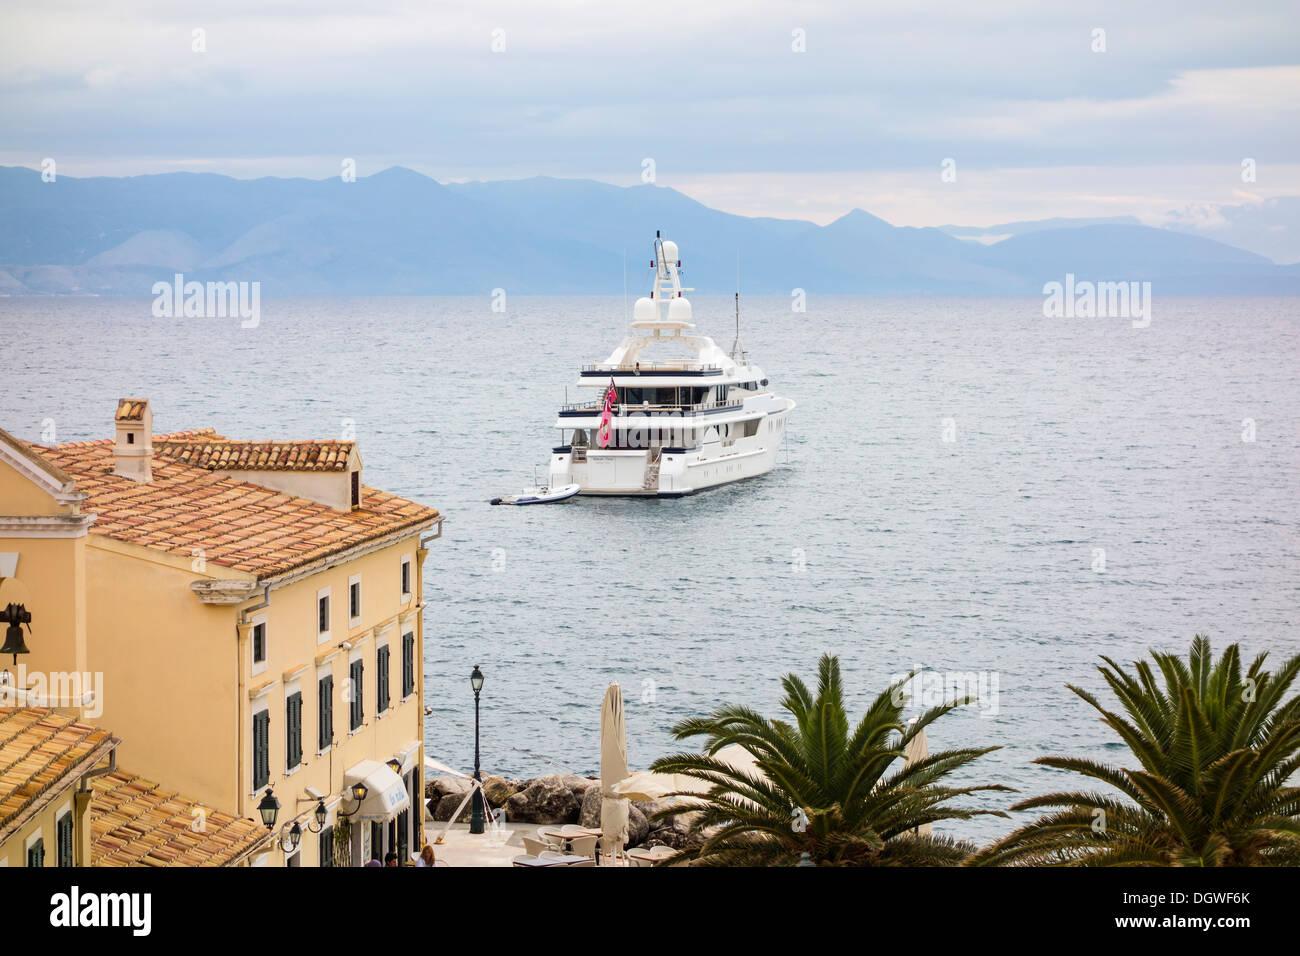 Deja Too - Old Town, Corfu Island, Ionian Islands, Greek Islands, Greece, Europe - Stock Image